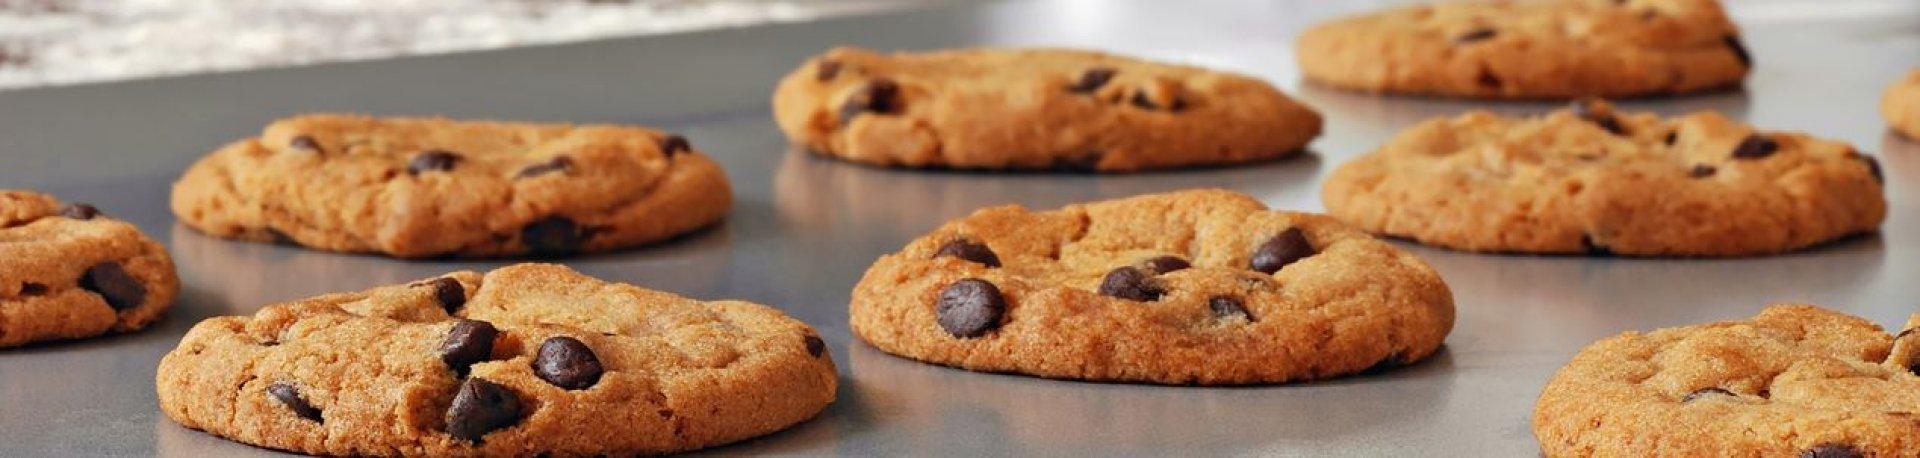 cms_cookies.jpeg